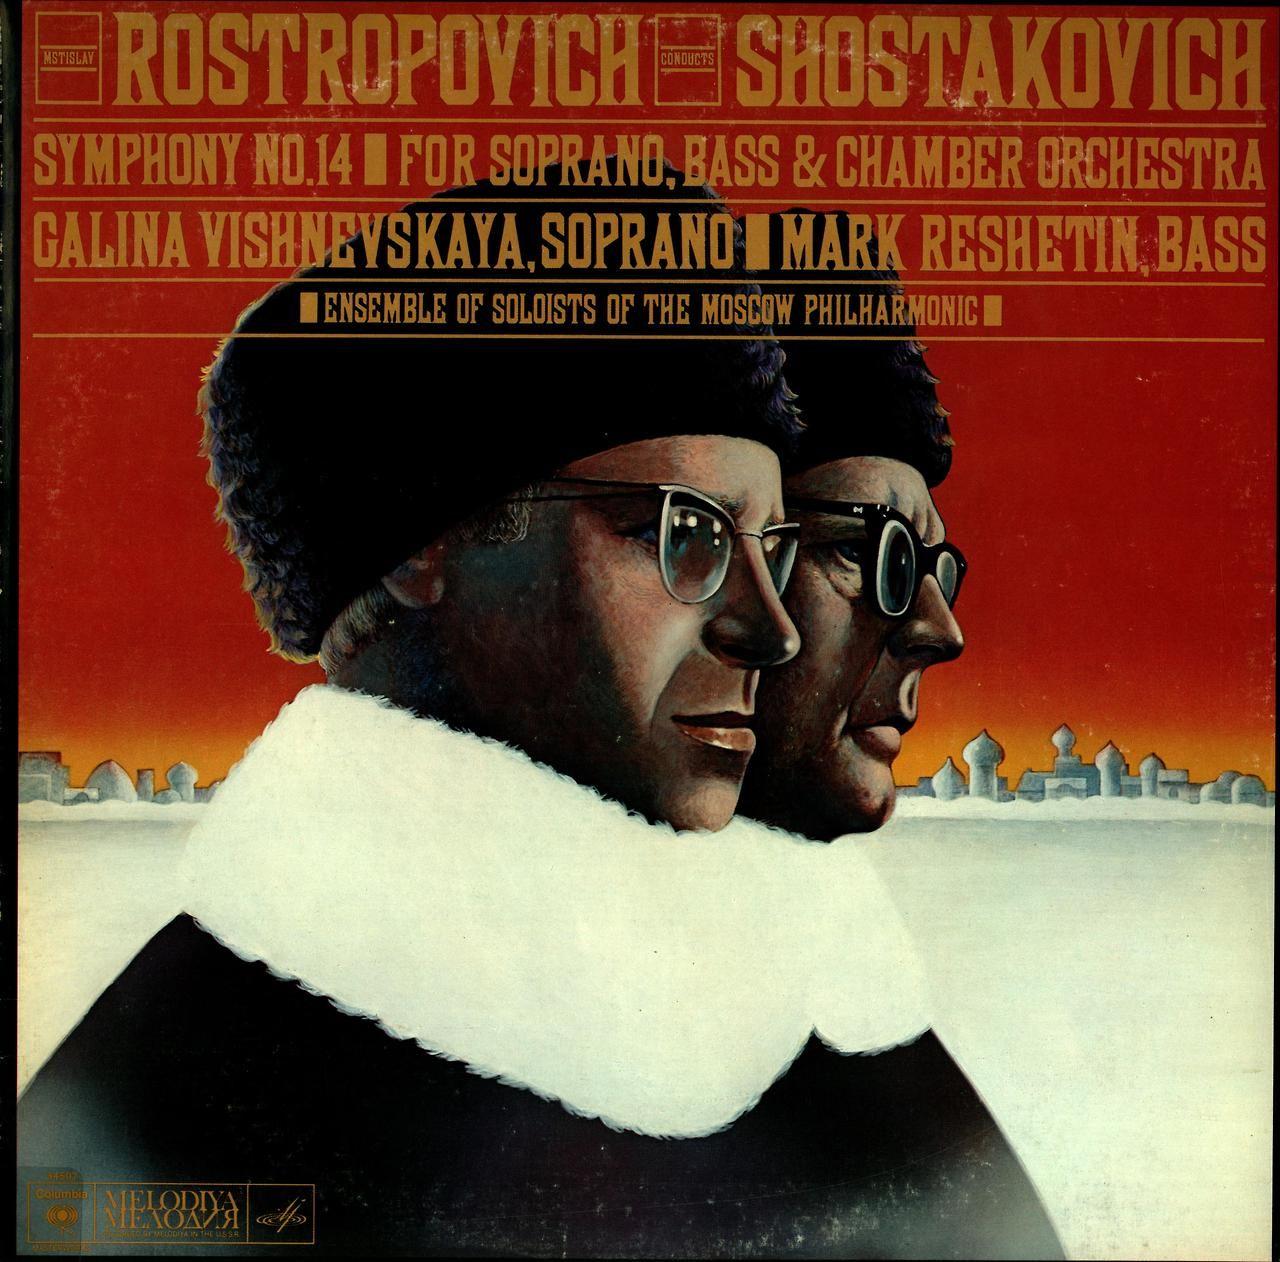 Shostakovich- Symphony No. 14 Moscow Philharmonic, Rostropovich, cond.